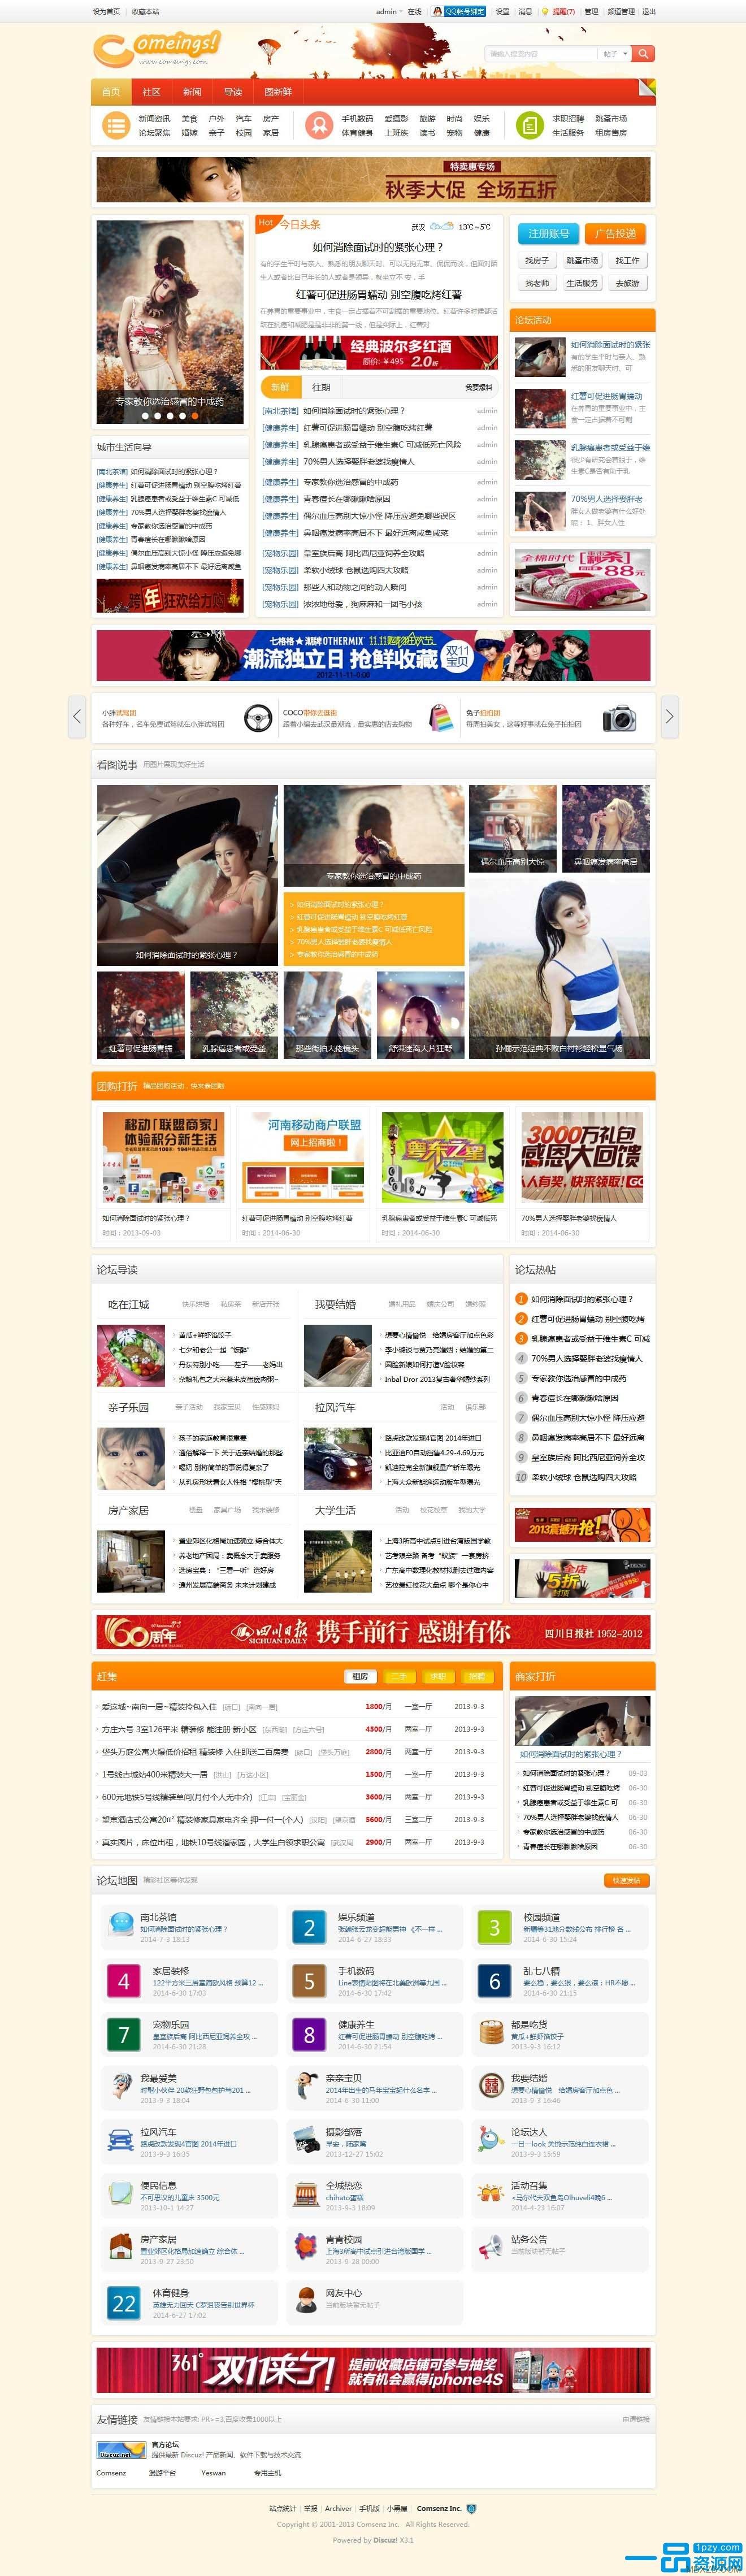 Cis_多配色城市门户 商业版V1 商业版dz模板,CSS+DIY制作的模板,带4个插件